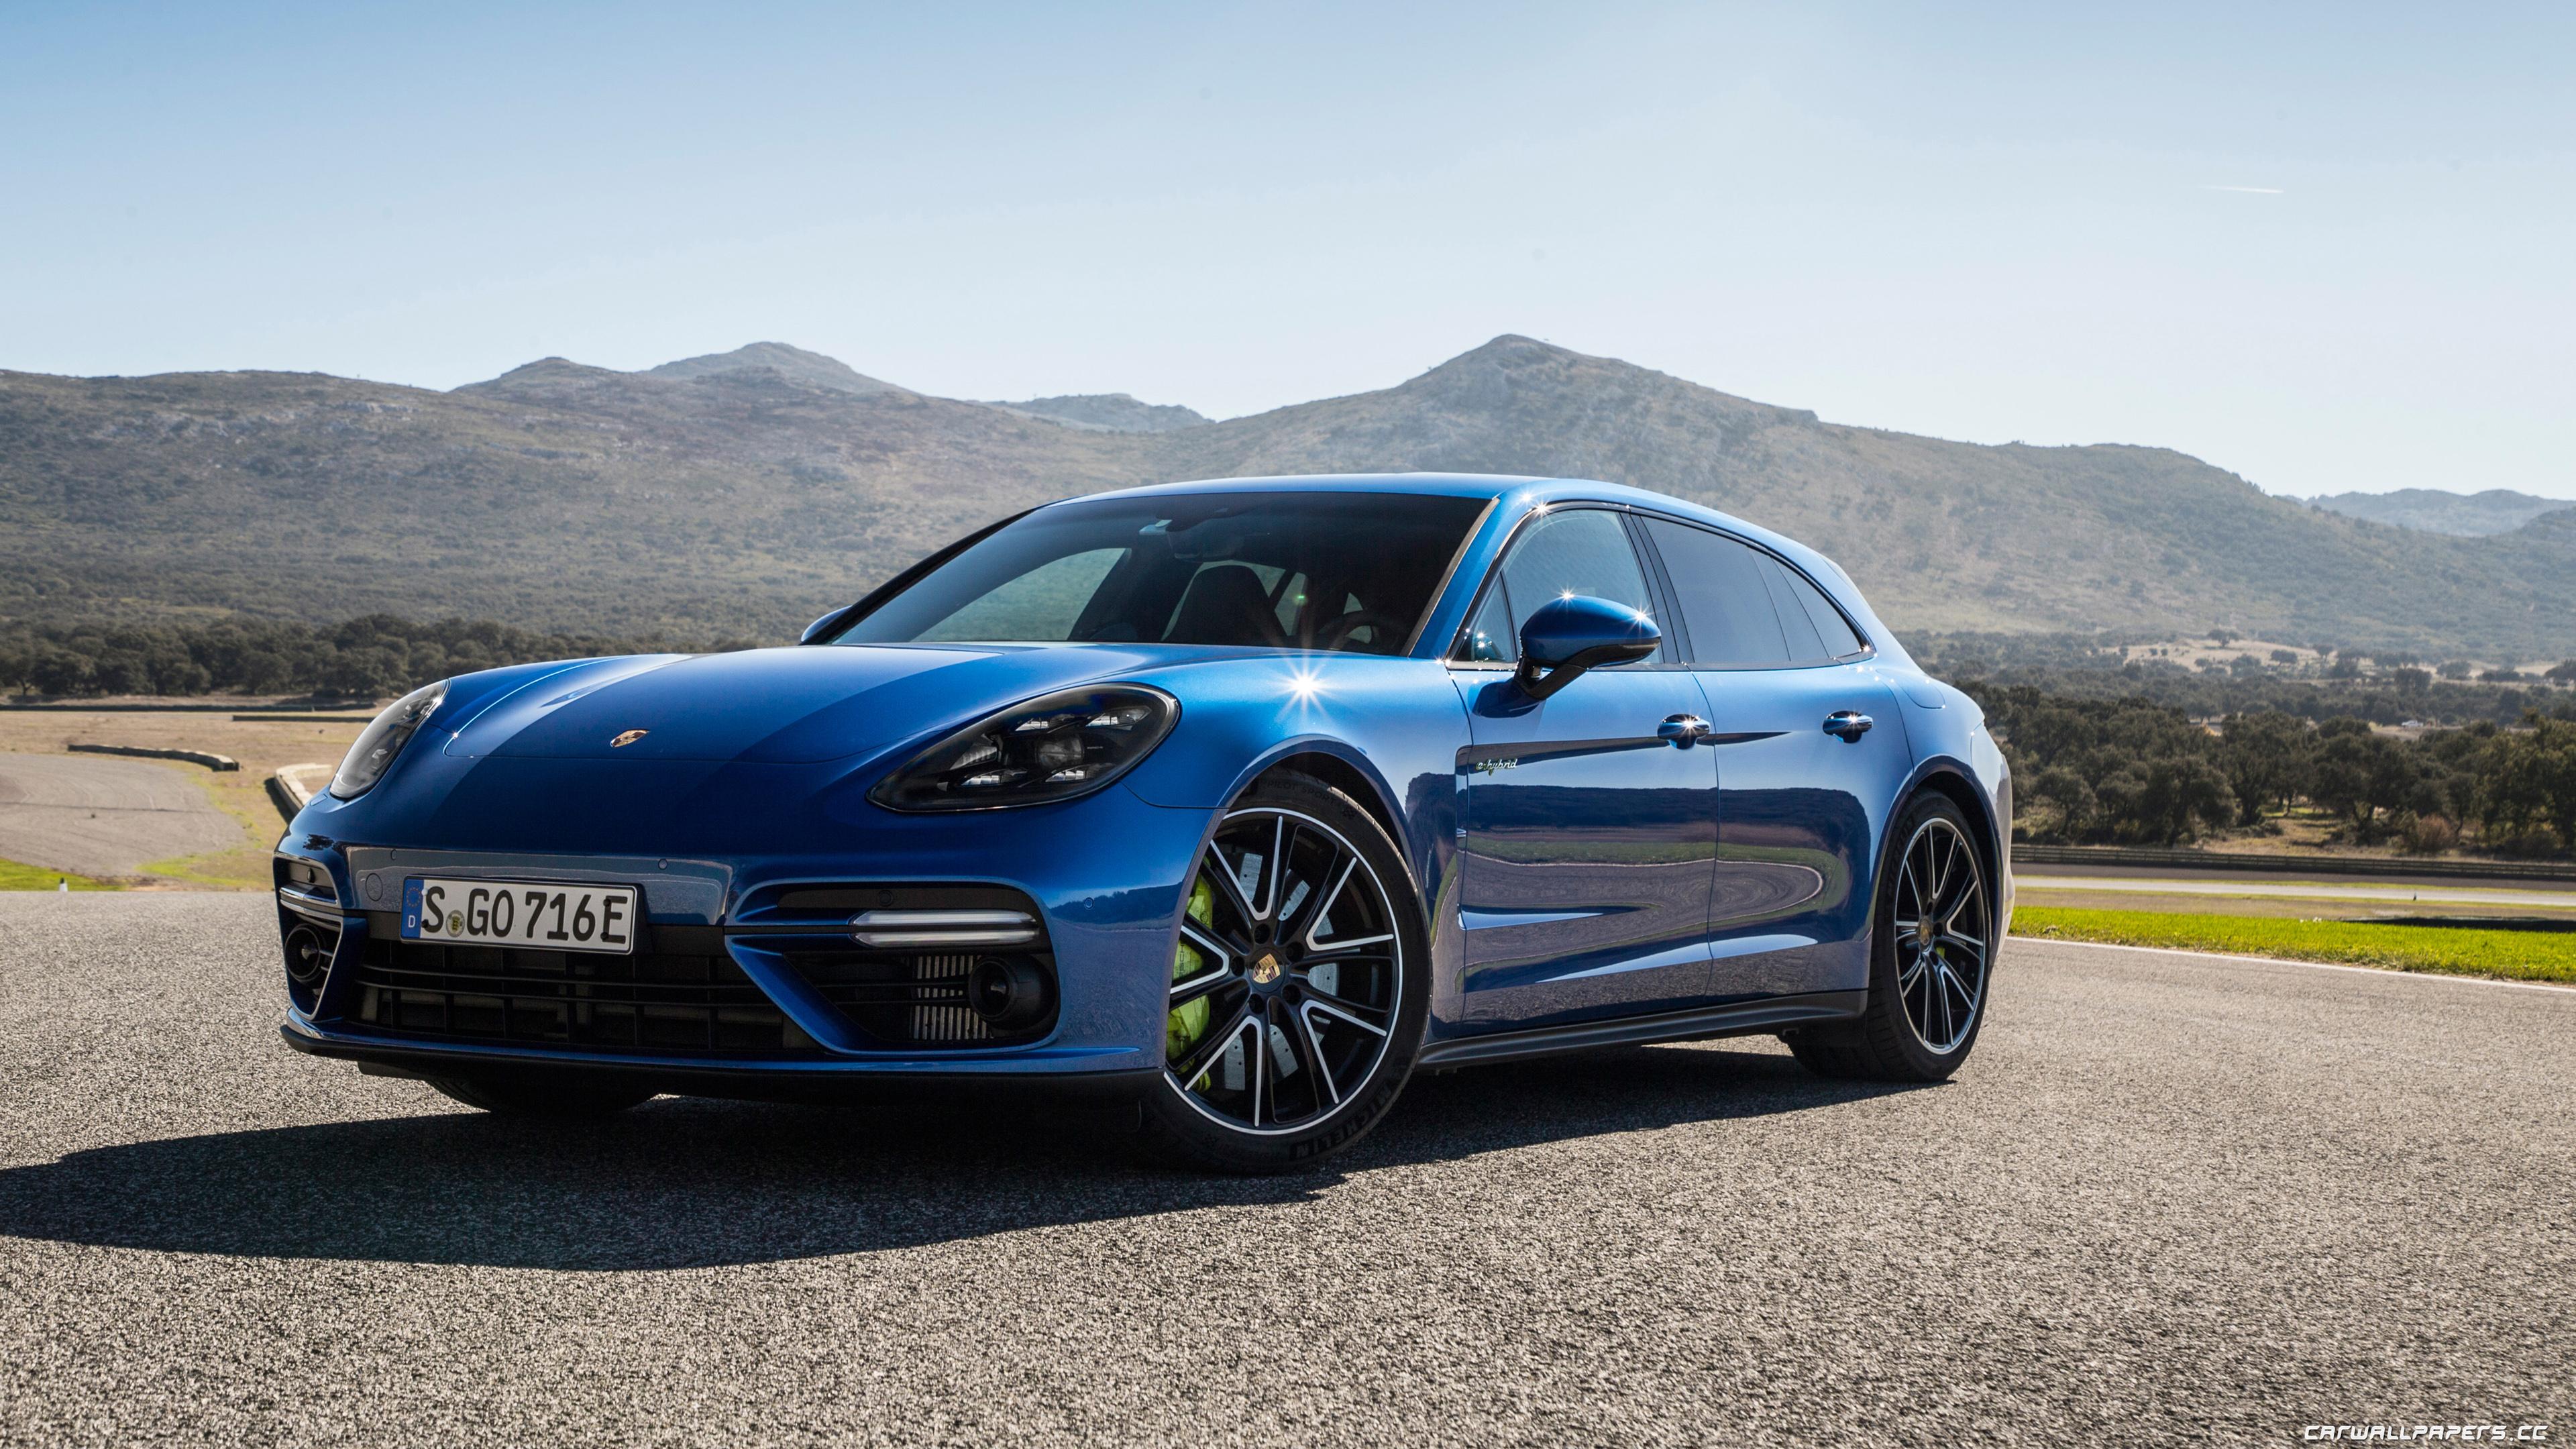 Cars Desktop Wallpapers Porsche Panamera Turbo S E Hybrid Sport Turismo Sapphire Blue Metallic 2017 Page 2